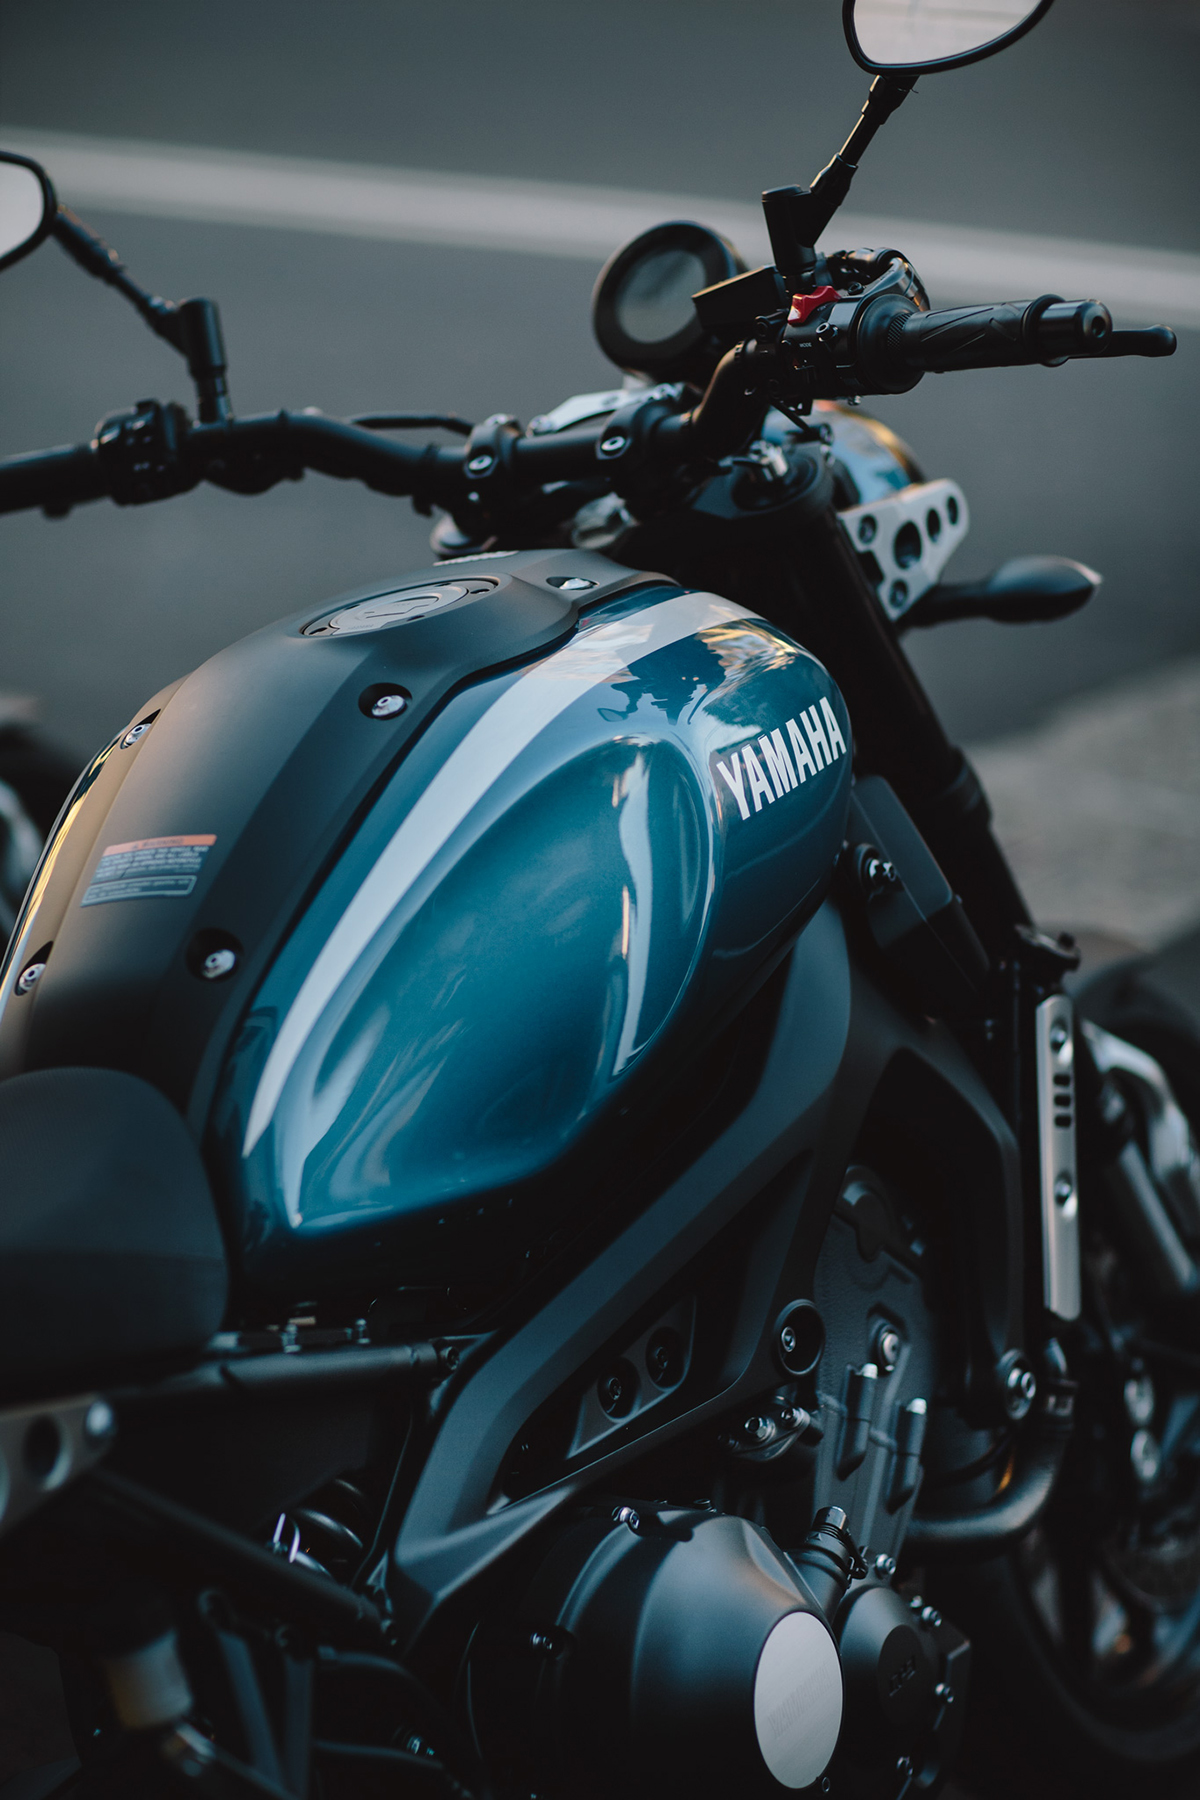 Yamaha-XSR-700-900_0433